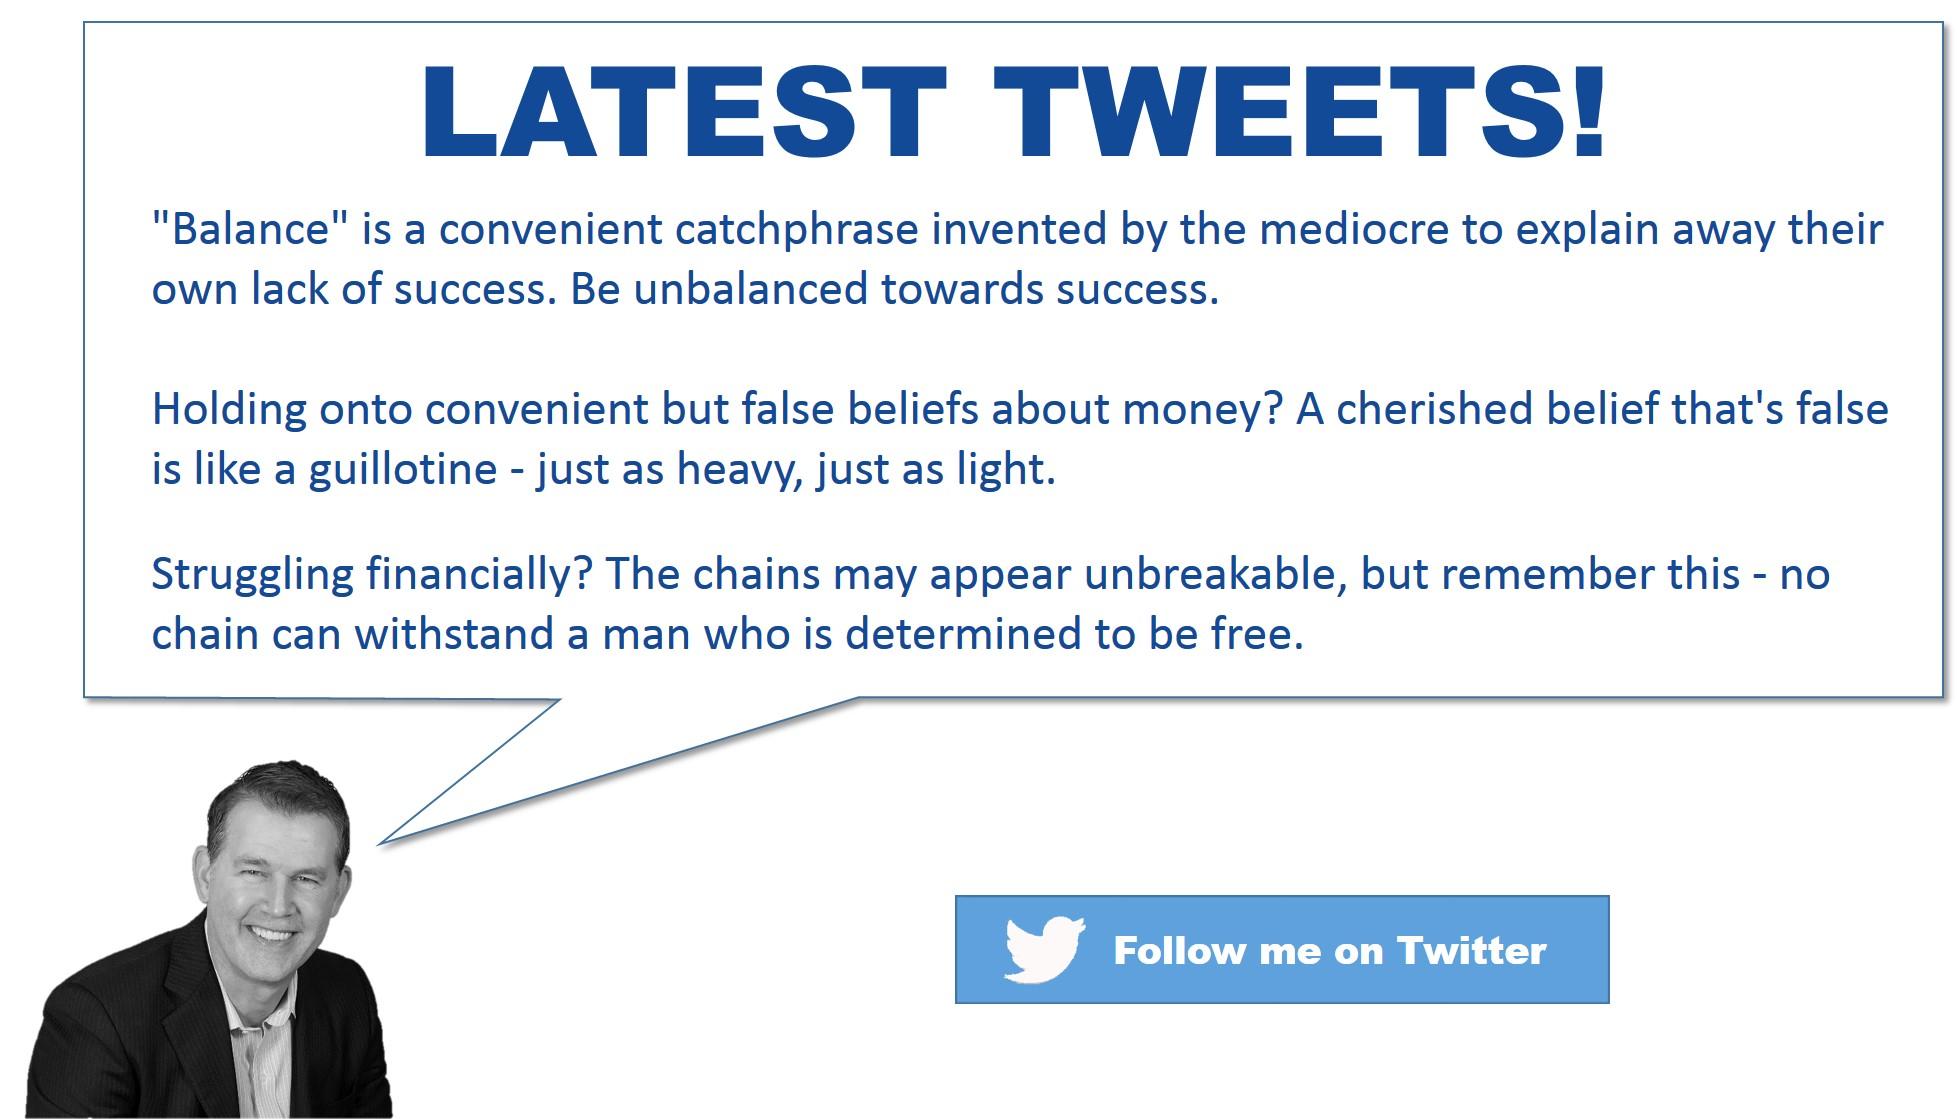 MontyCampbell-Tweets-9-2-17